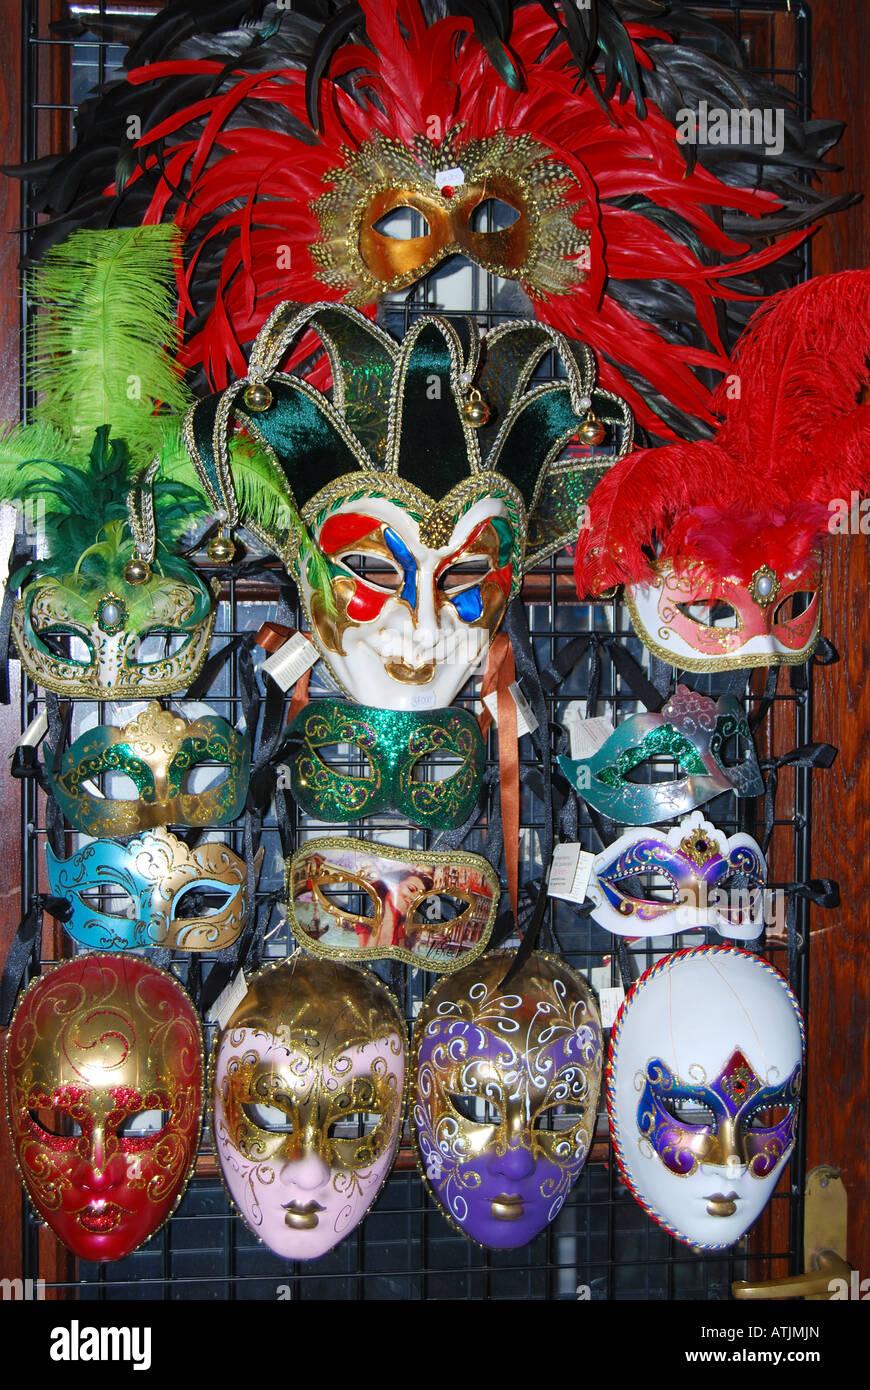 Opera Masks, The State Opera House, Pest, Budapest, Republic of Hungary - Stock Image